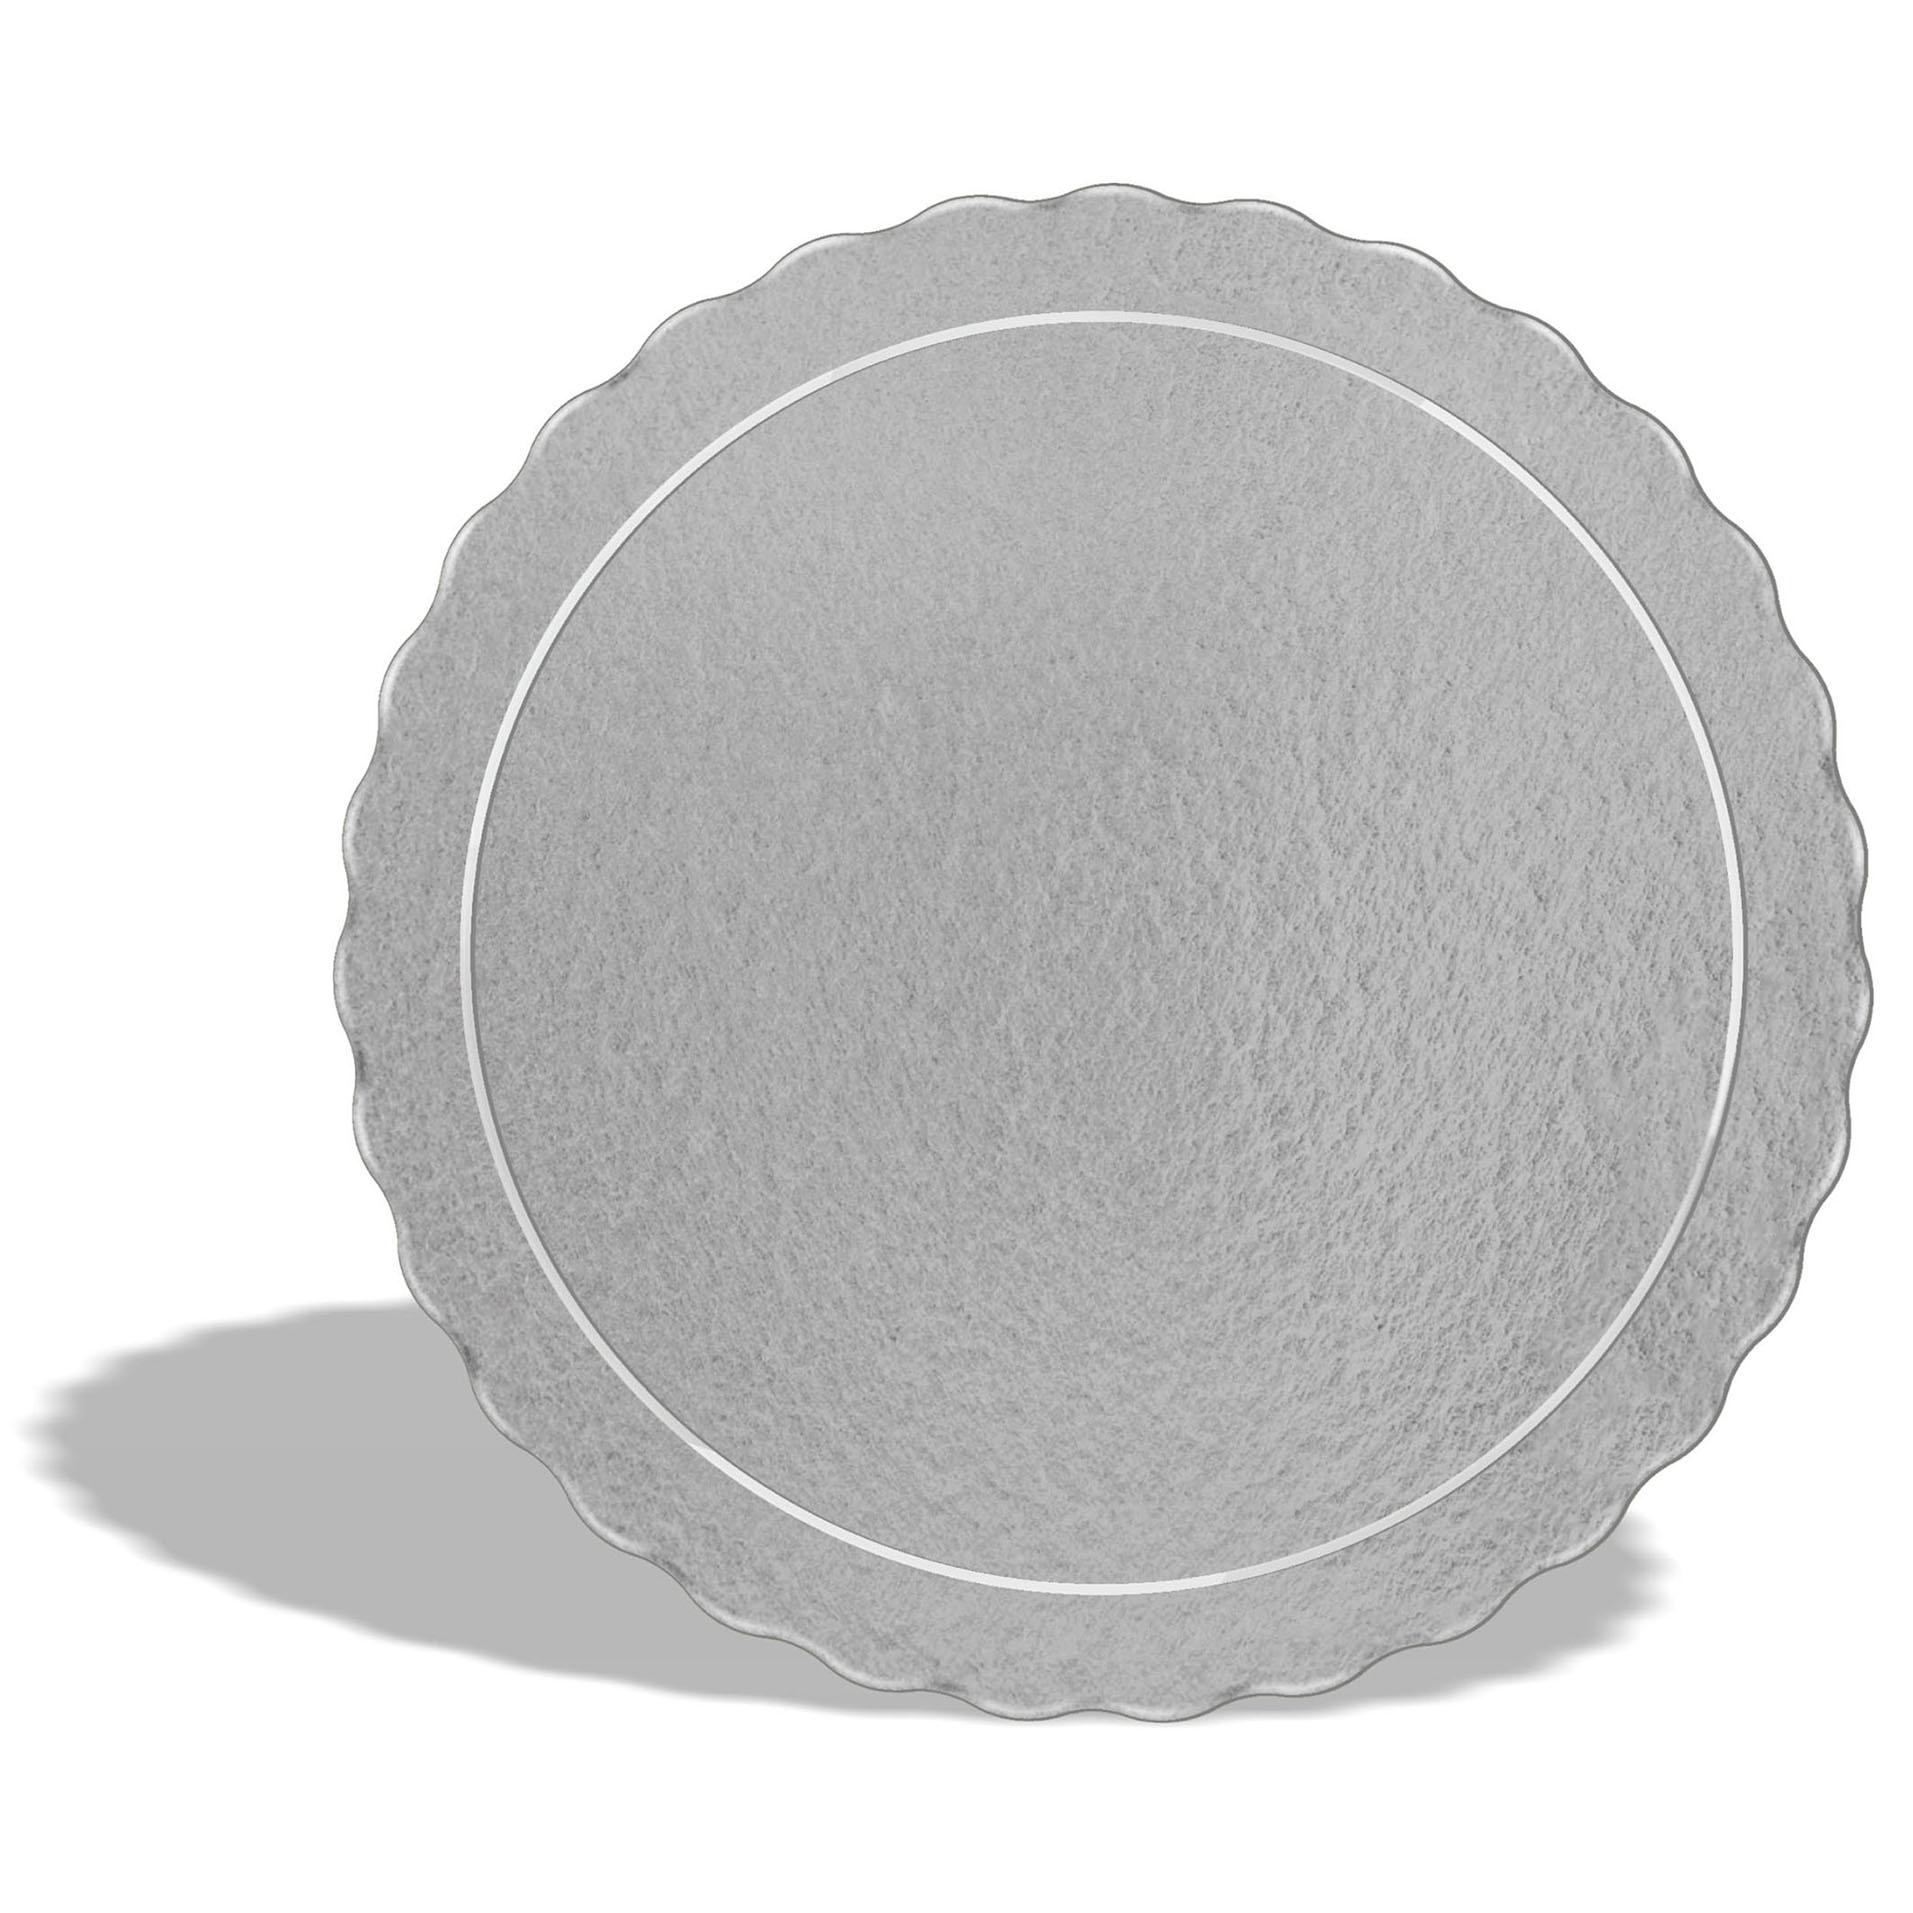 50 Bases Laminadas P/ Bolo 35cm - Prata